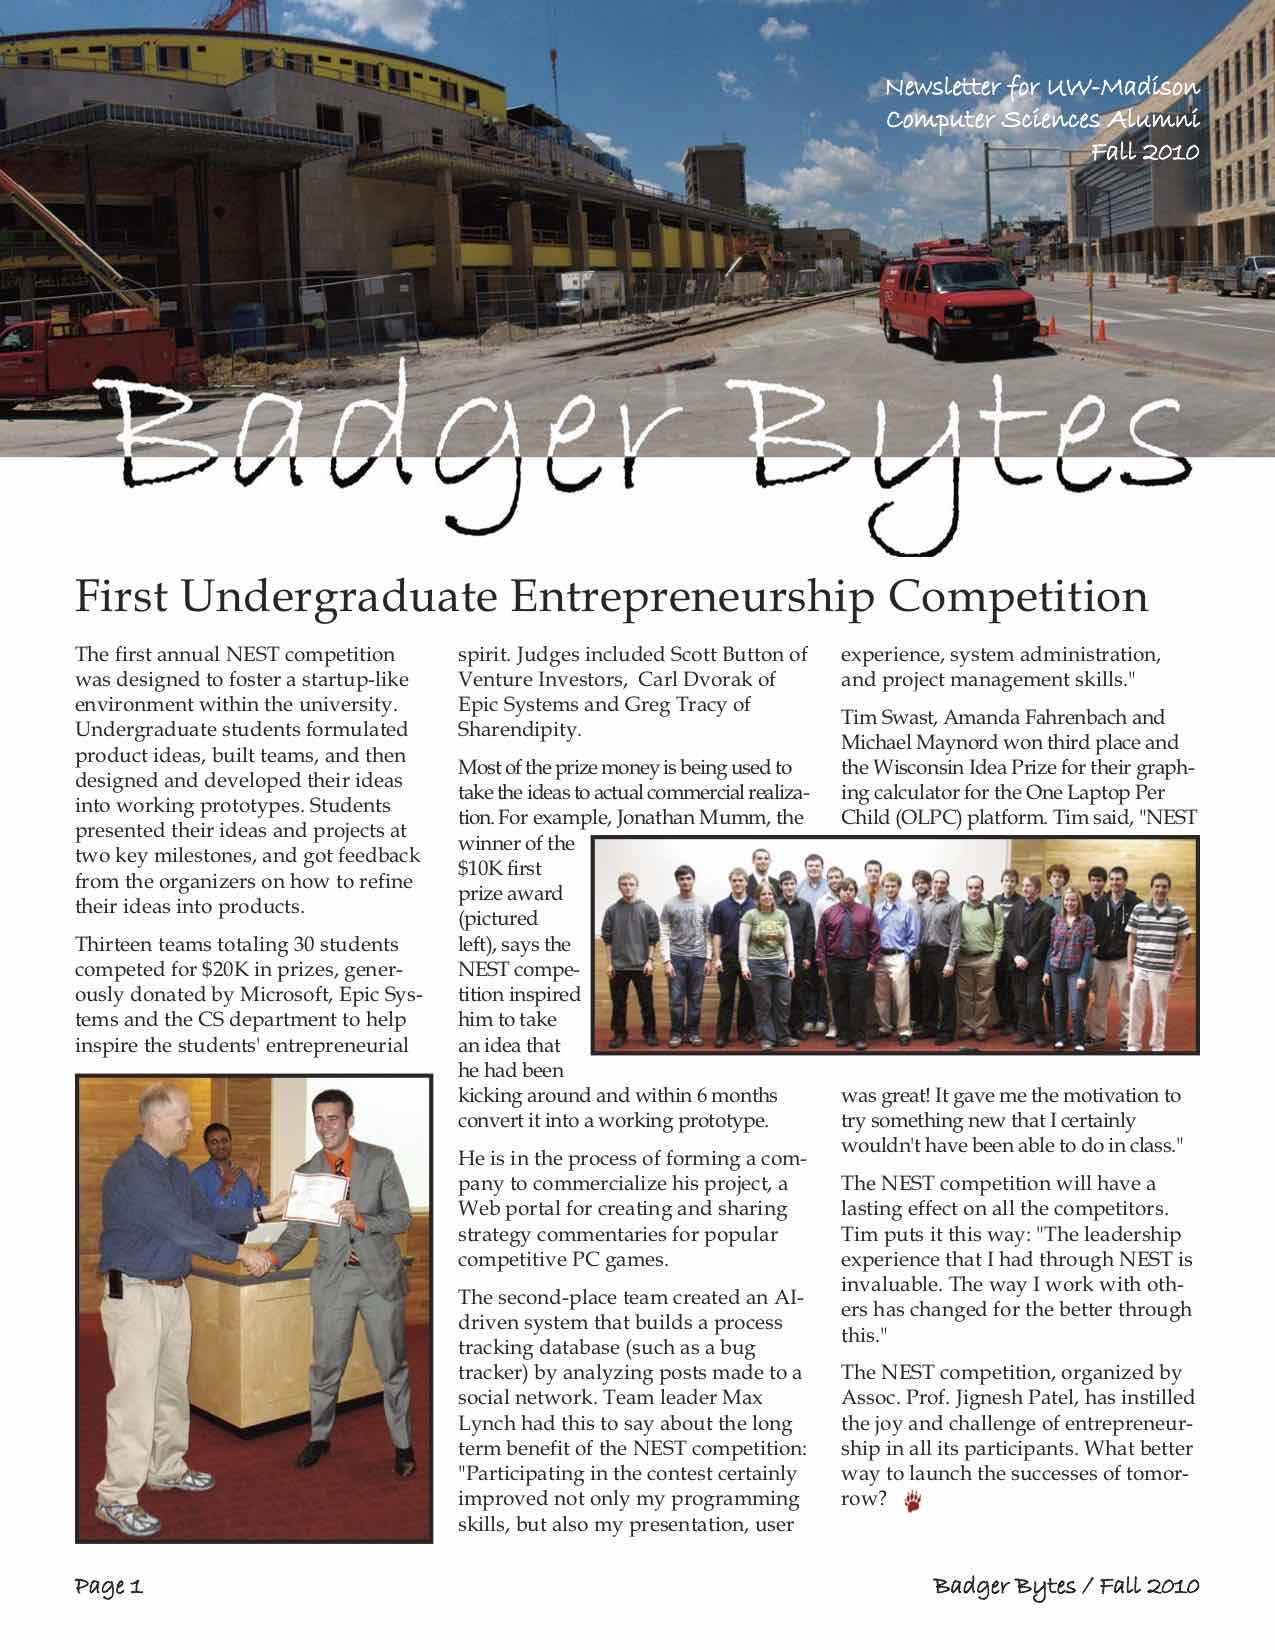 BB-2010 article.jpg